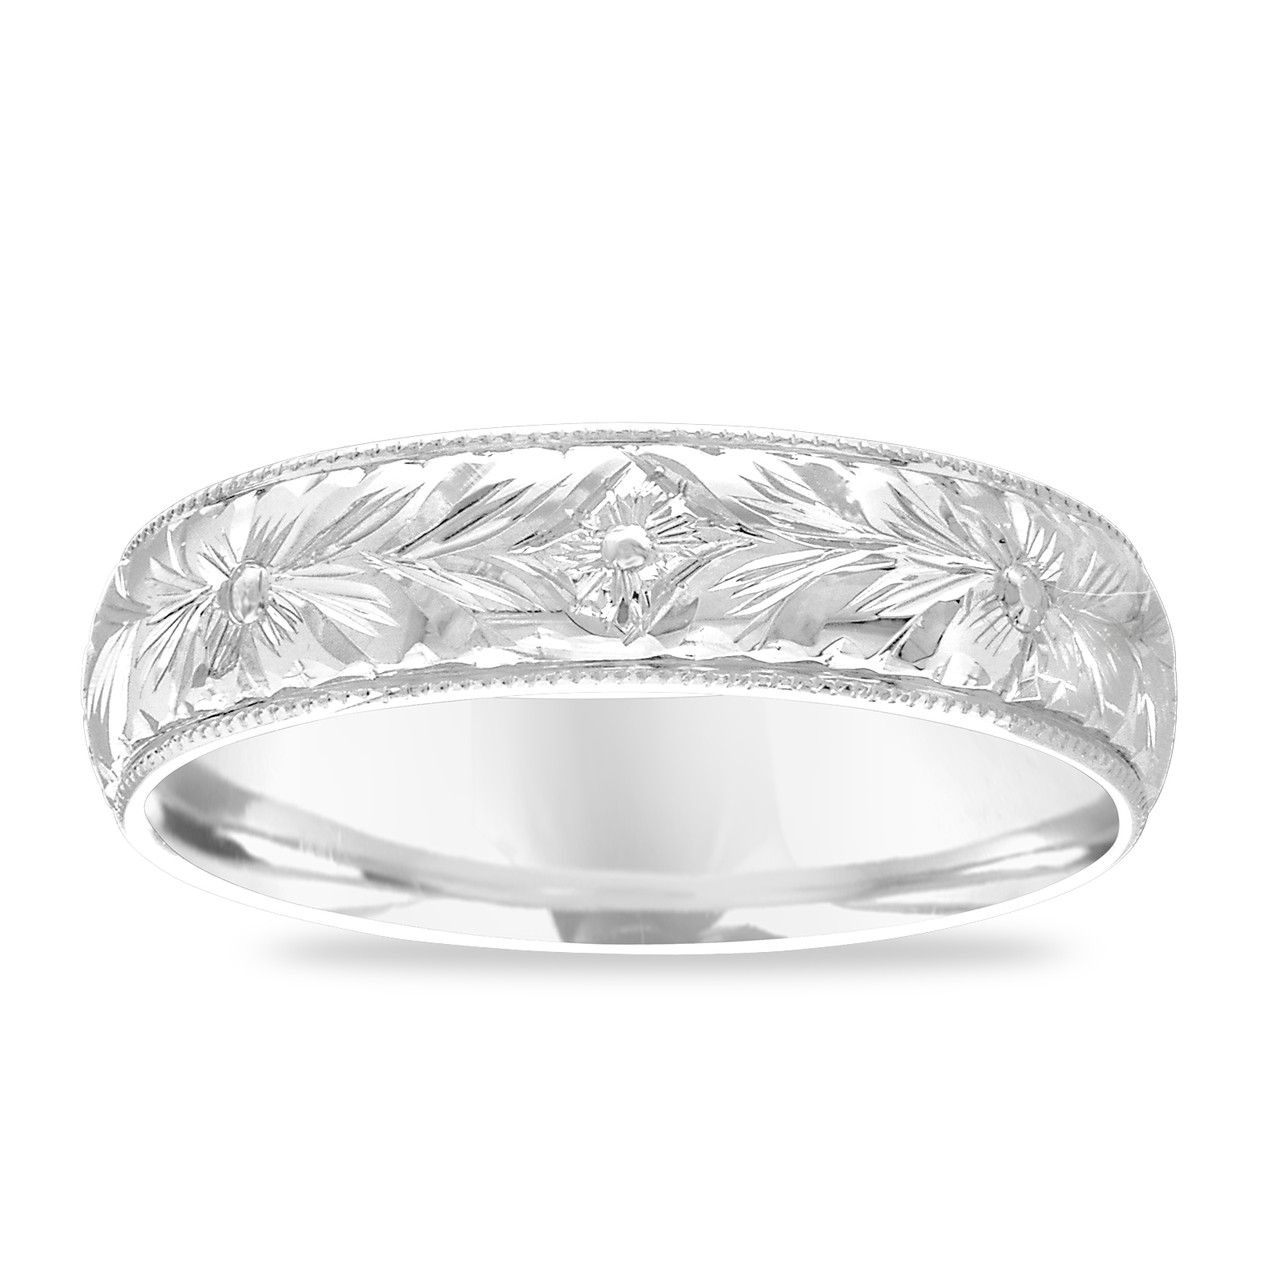 Hand Engraved Men's Wedding Band, Platinum Wedding Ring